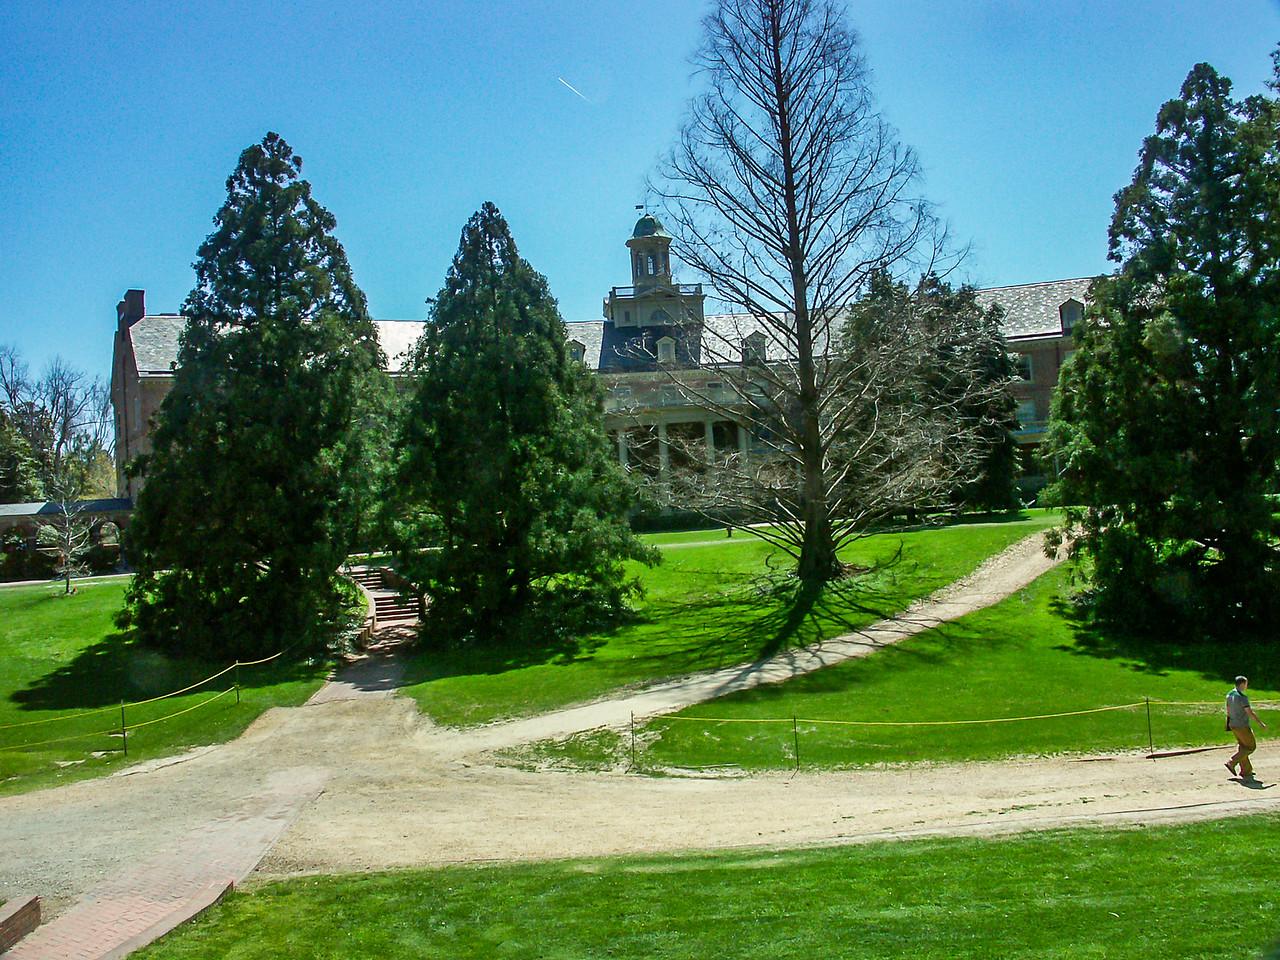 William and Merry College